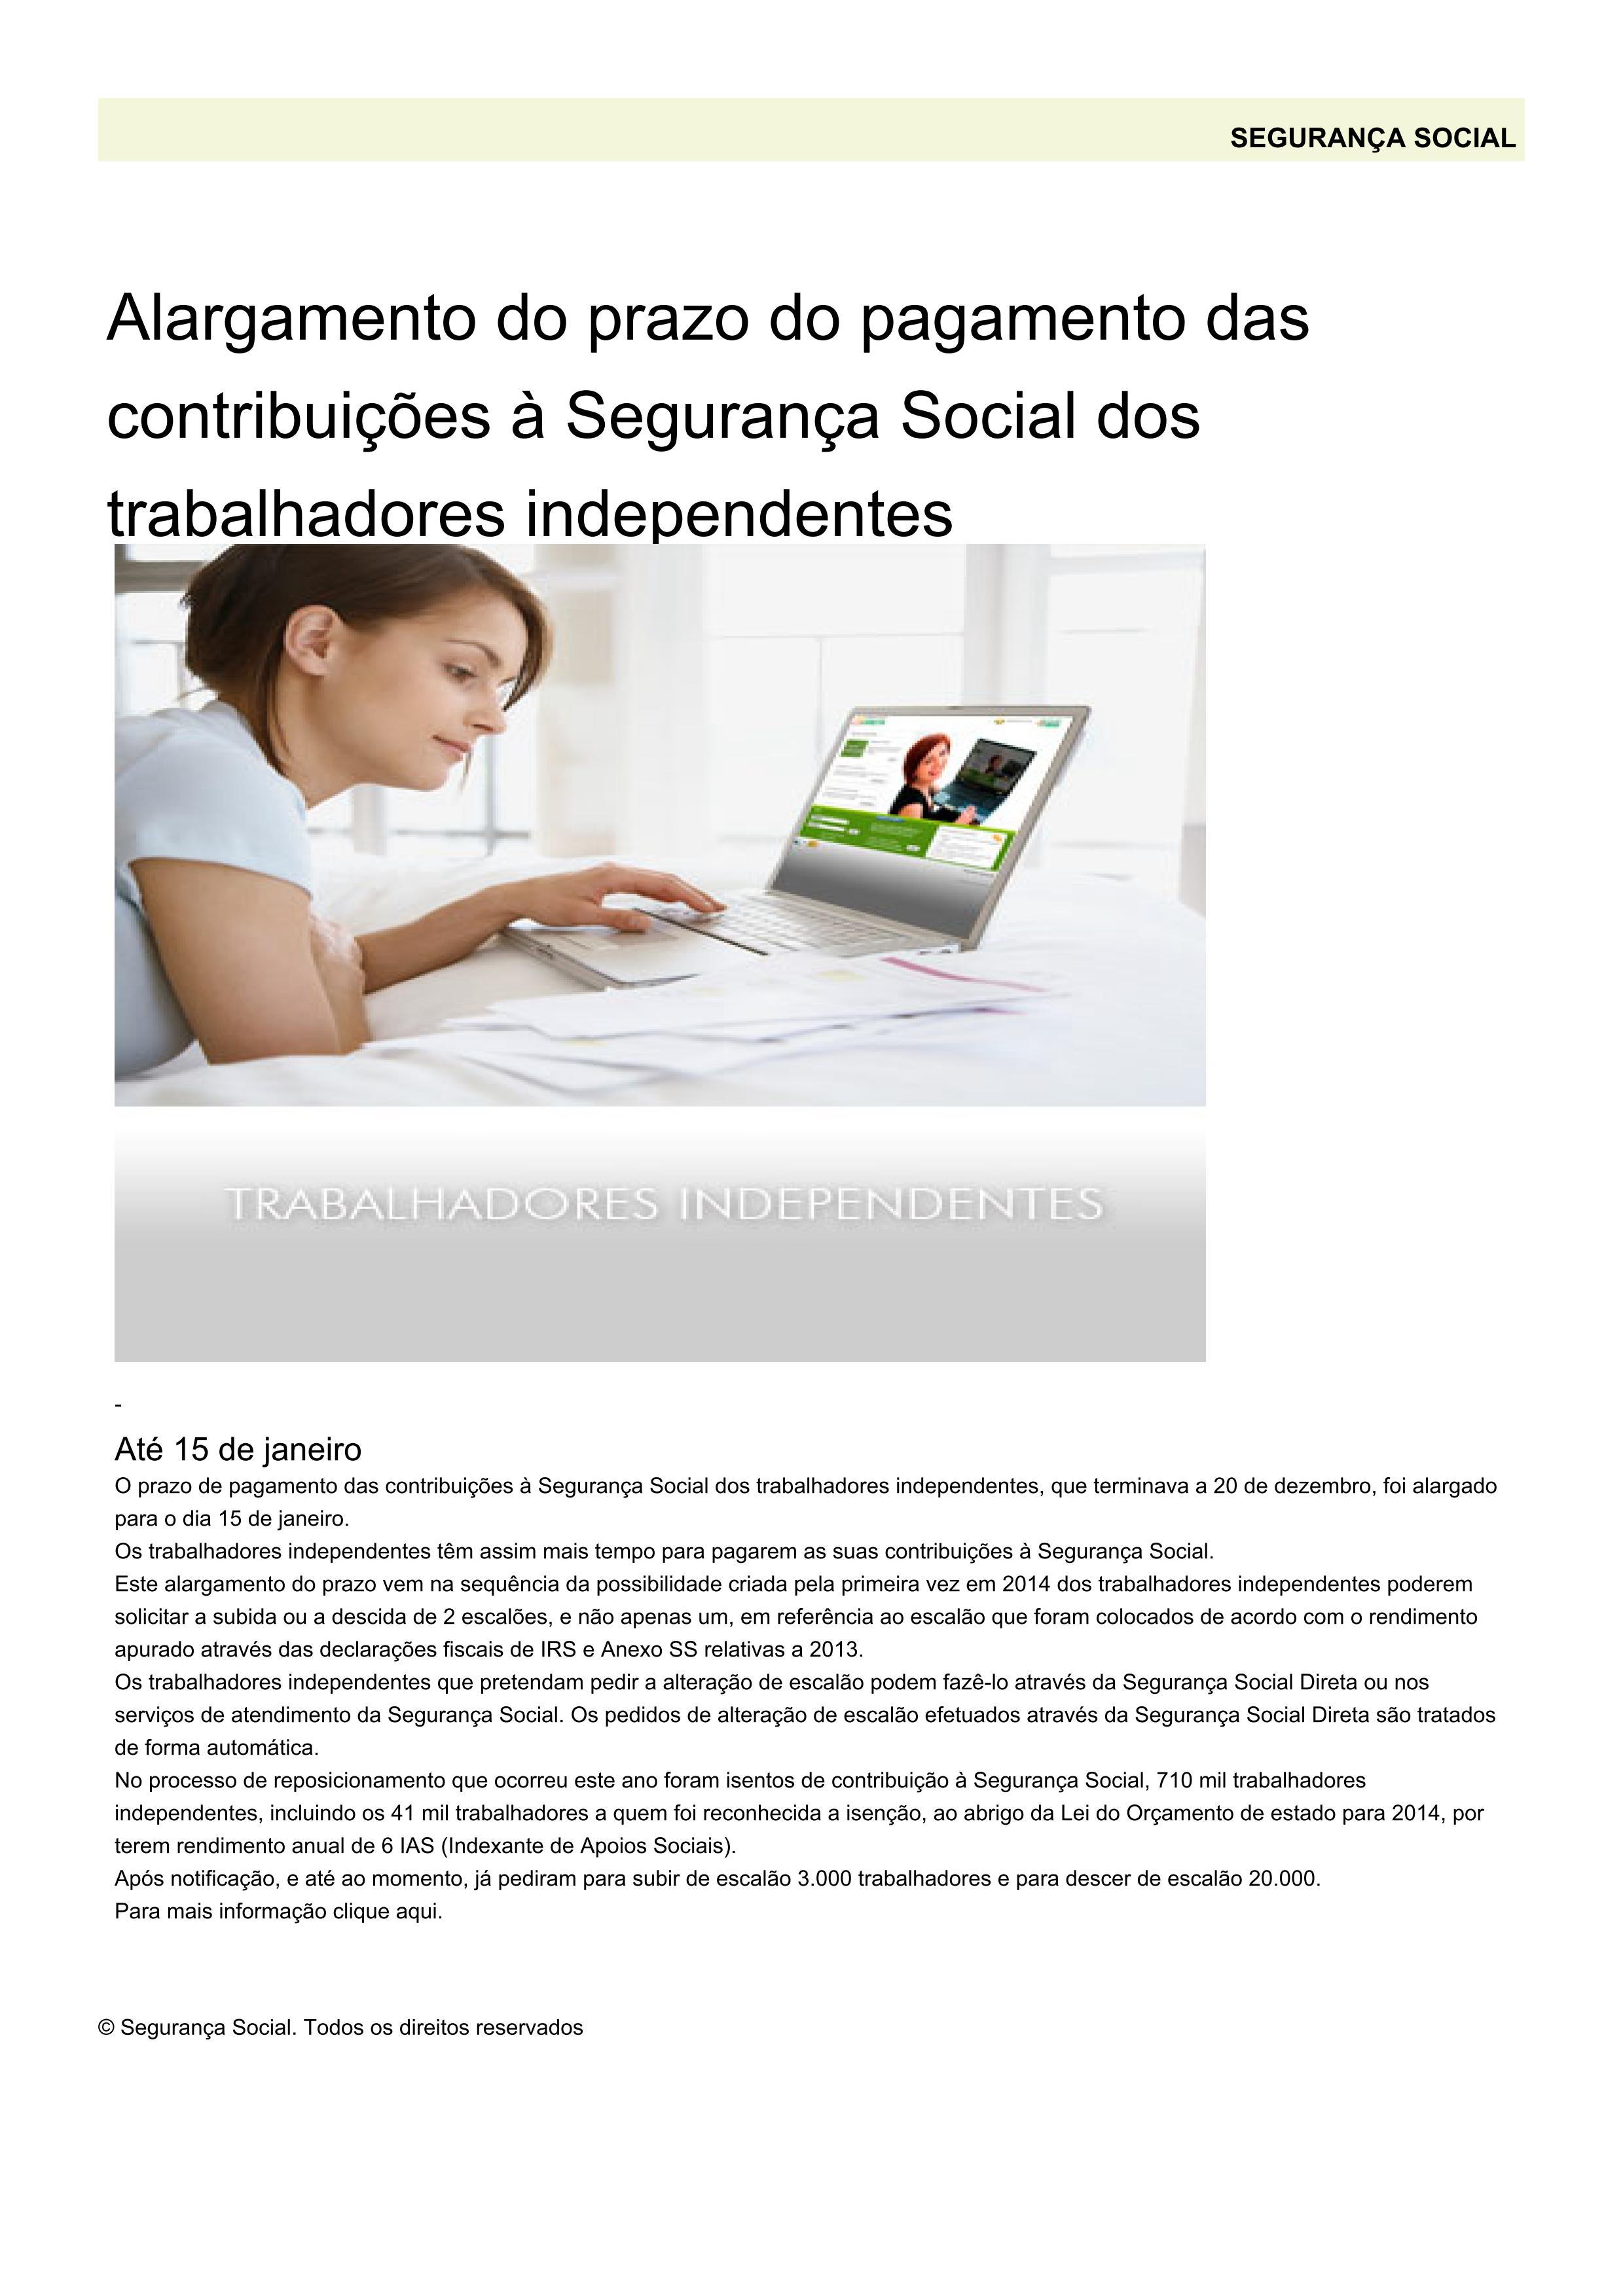 inf_Seg_Social_Dez_2014_01